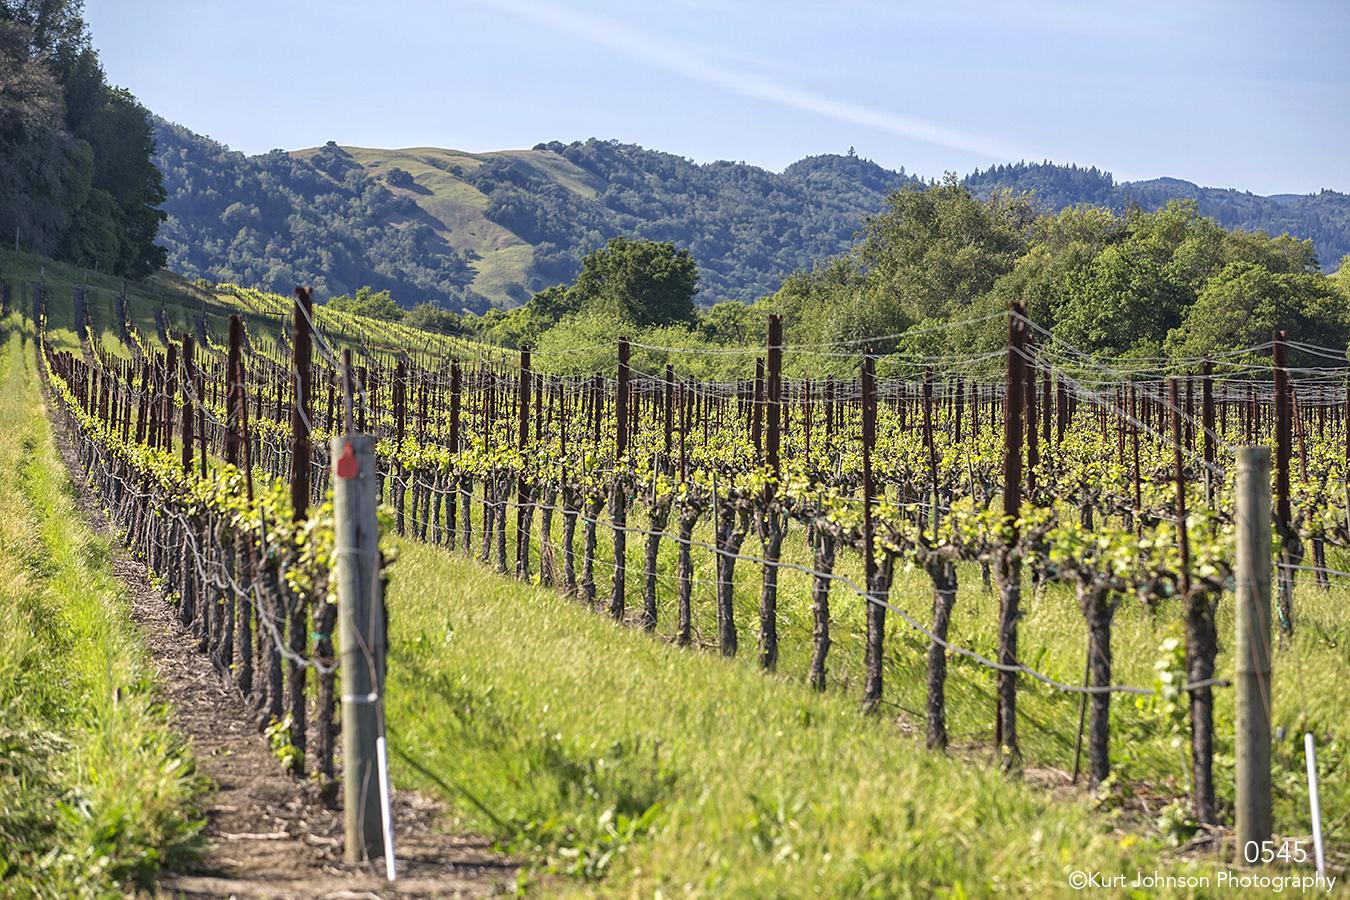 landscape mountains winery california vine